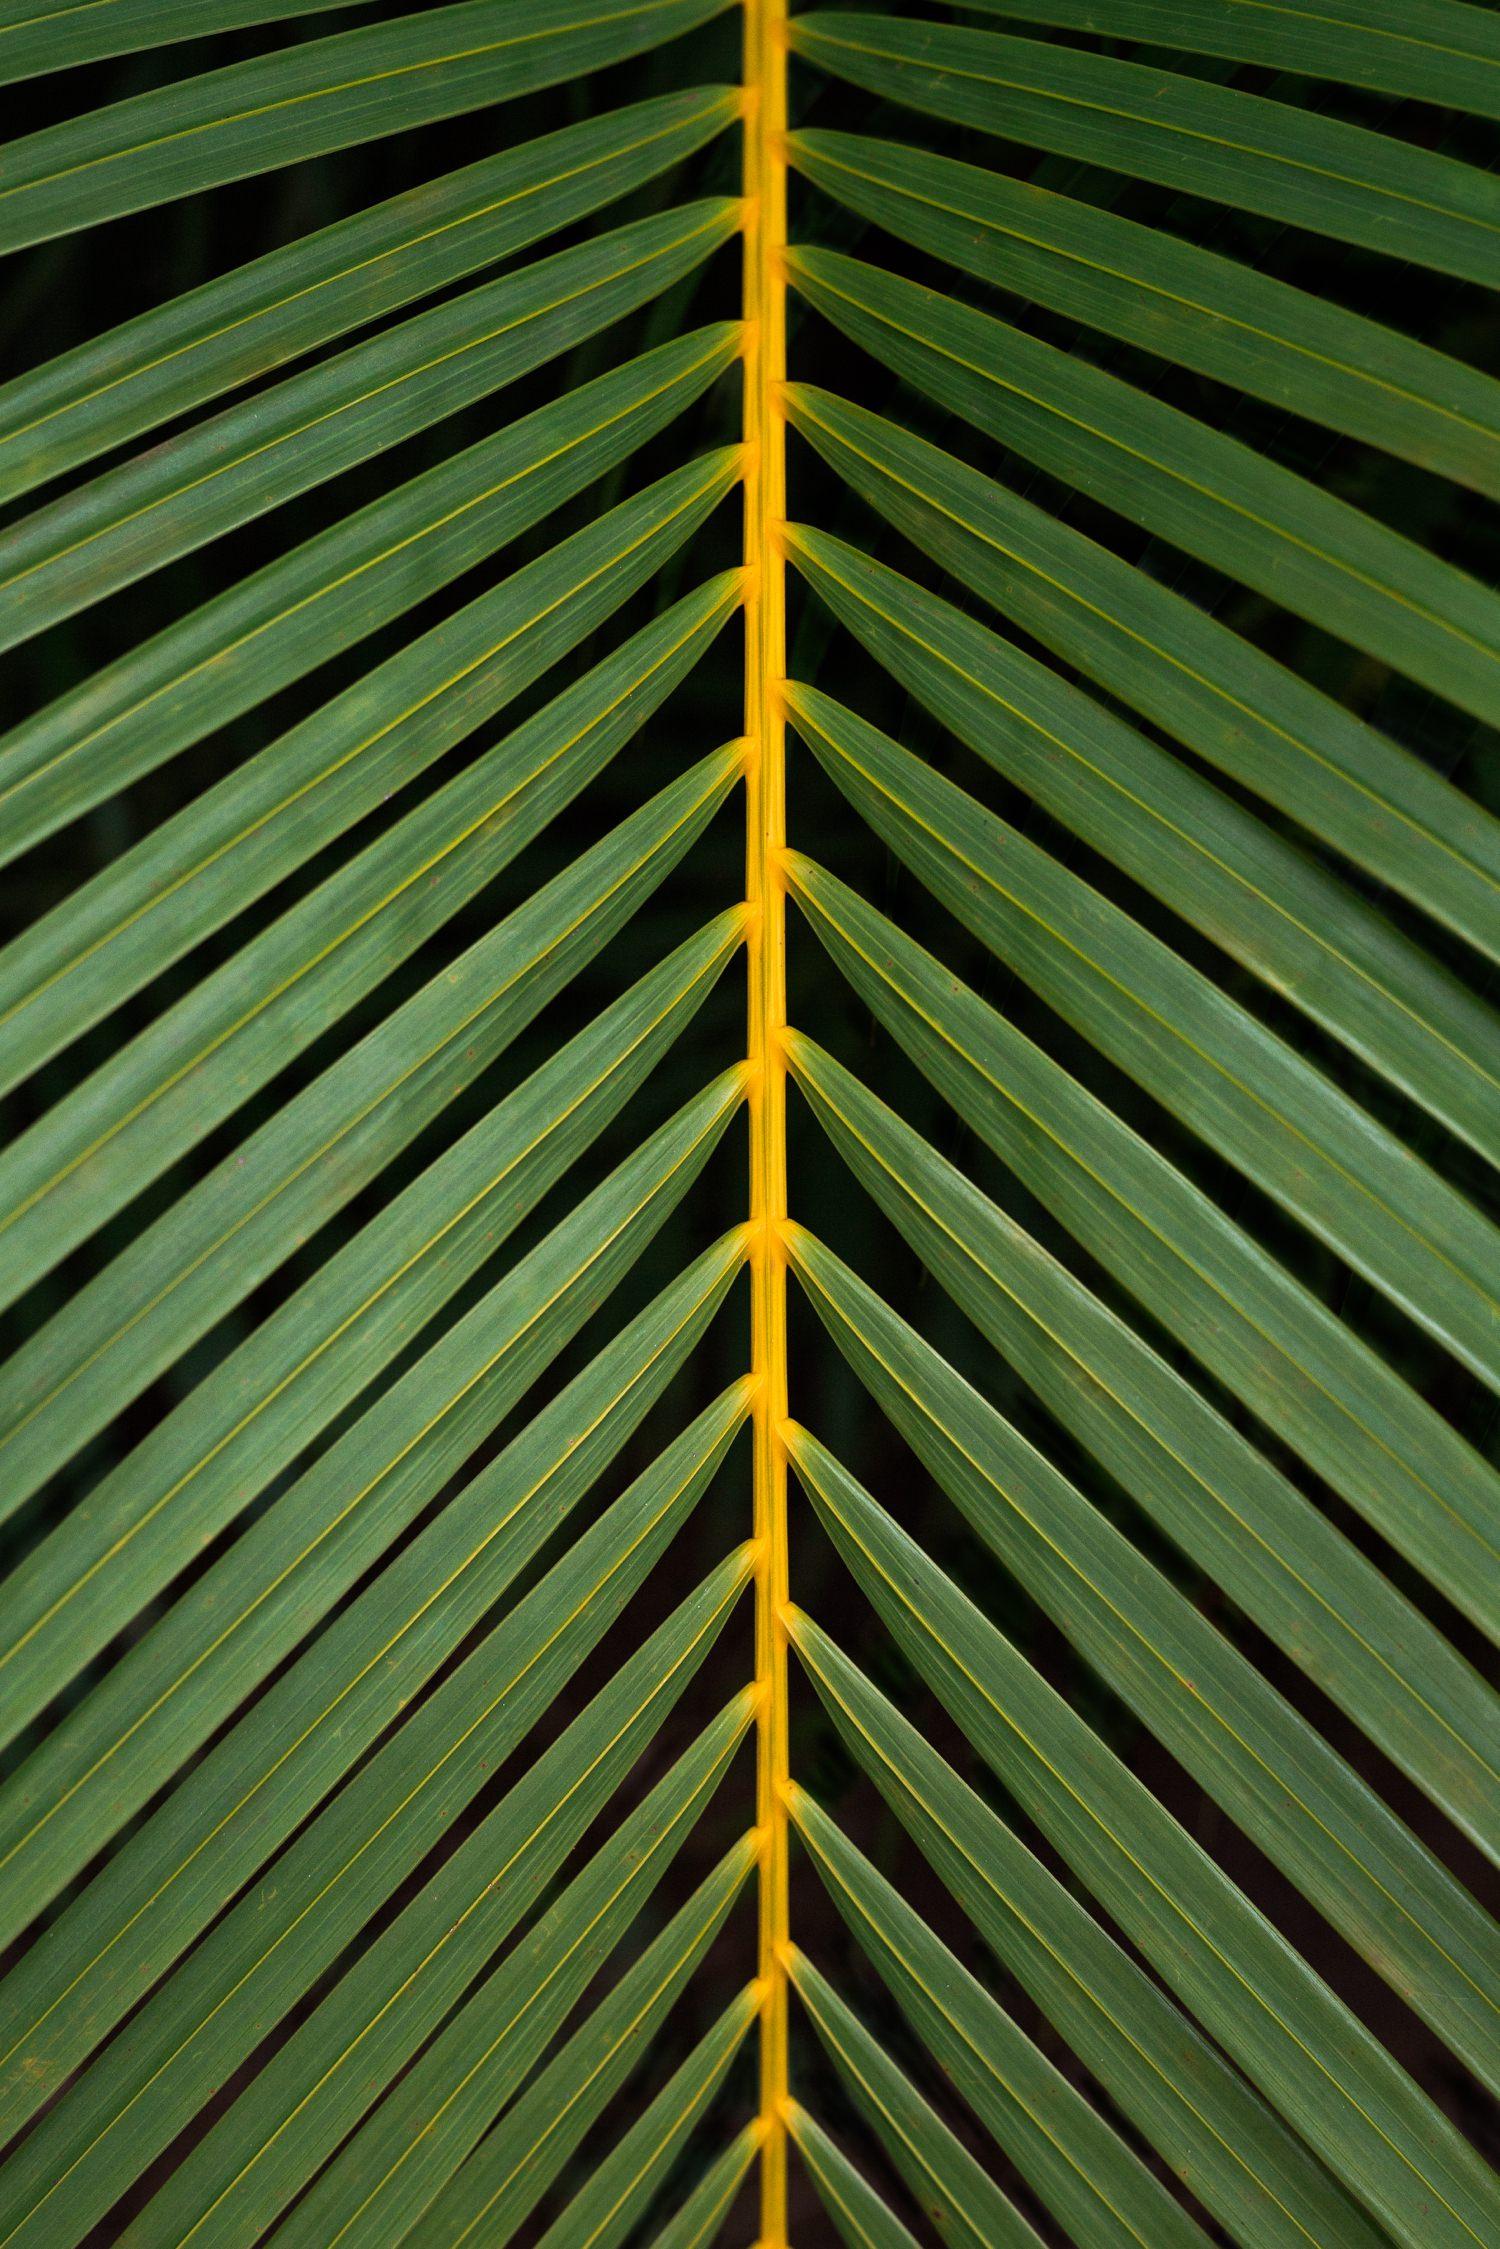 cameron-zegers-photography-hawaii-palm.jpg